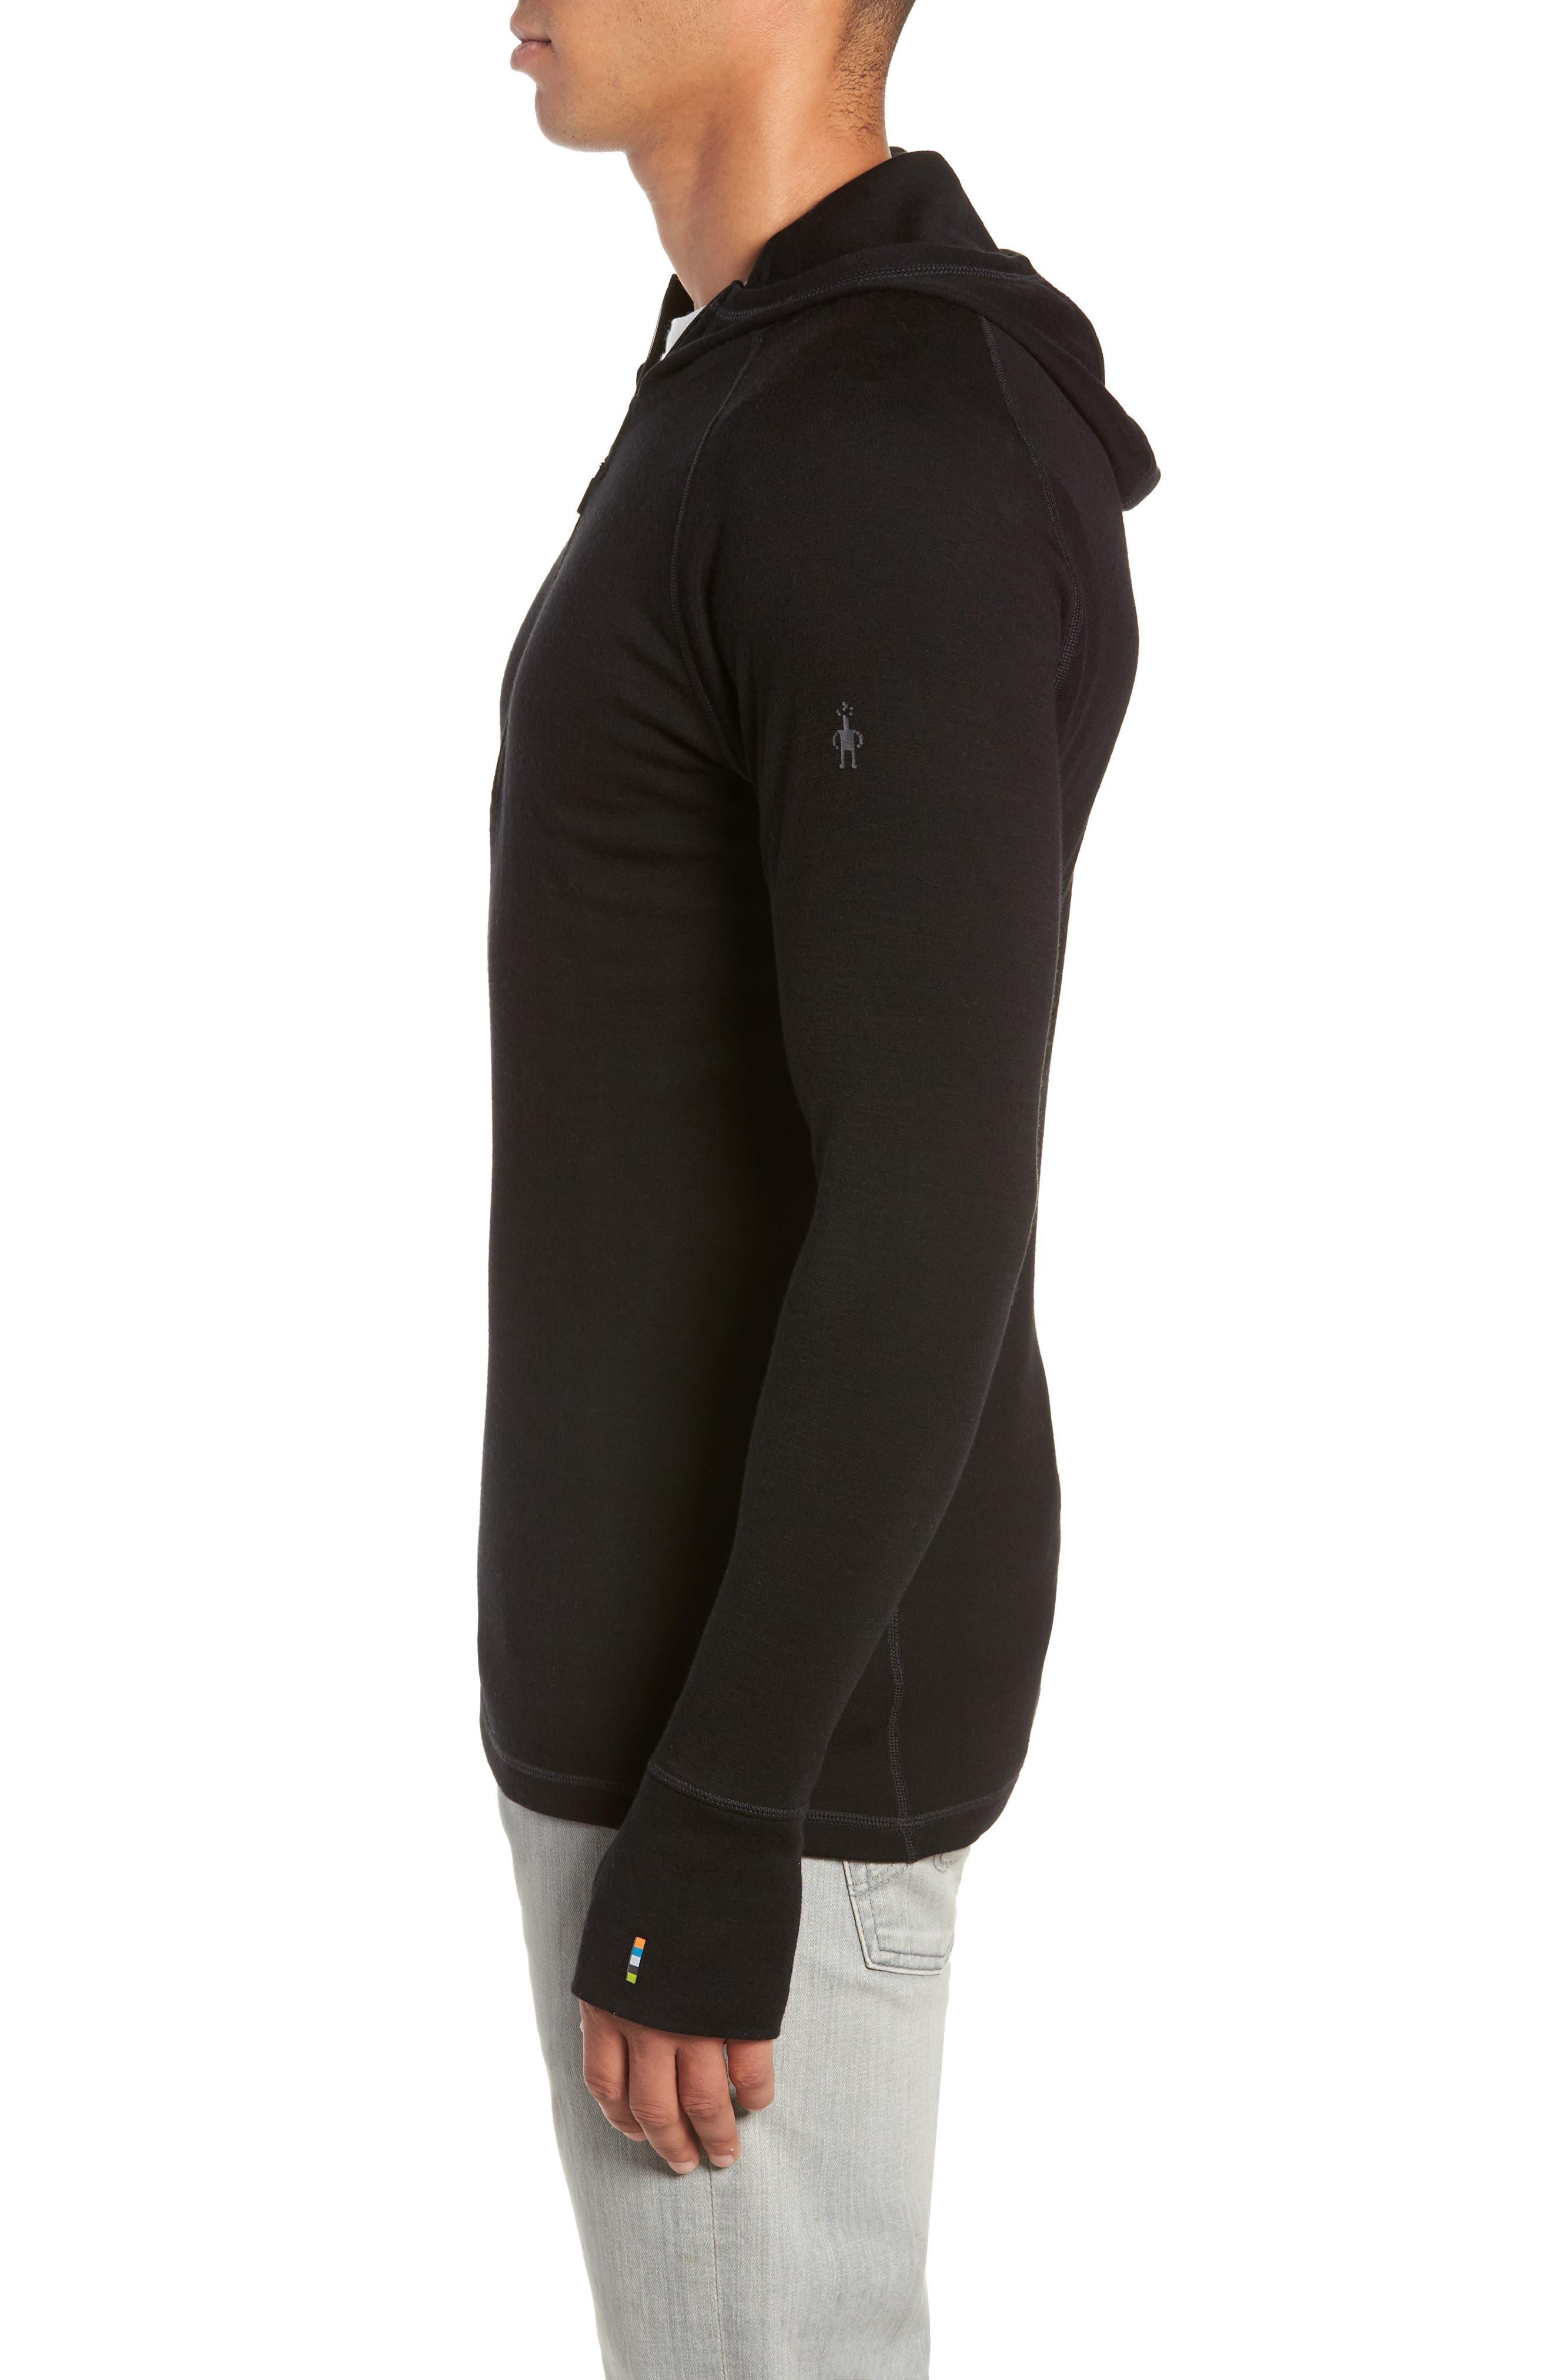 Merino 250 Base Layer Hooded Pullover,                             Alternate thumbnail 3, color,                             001